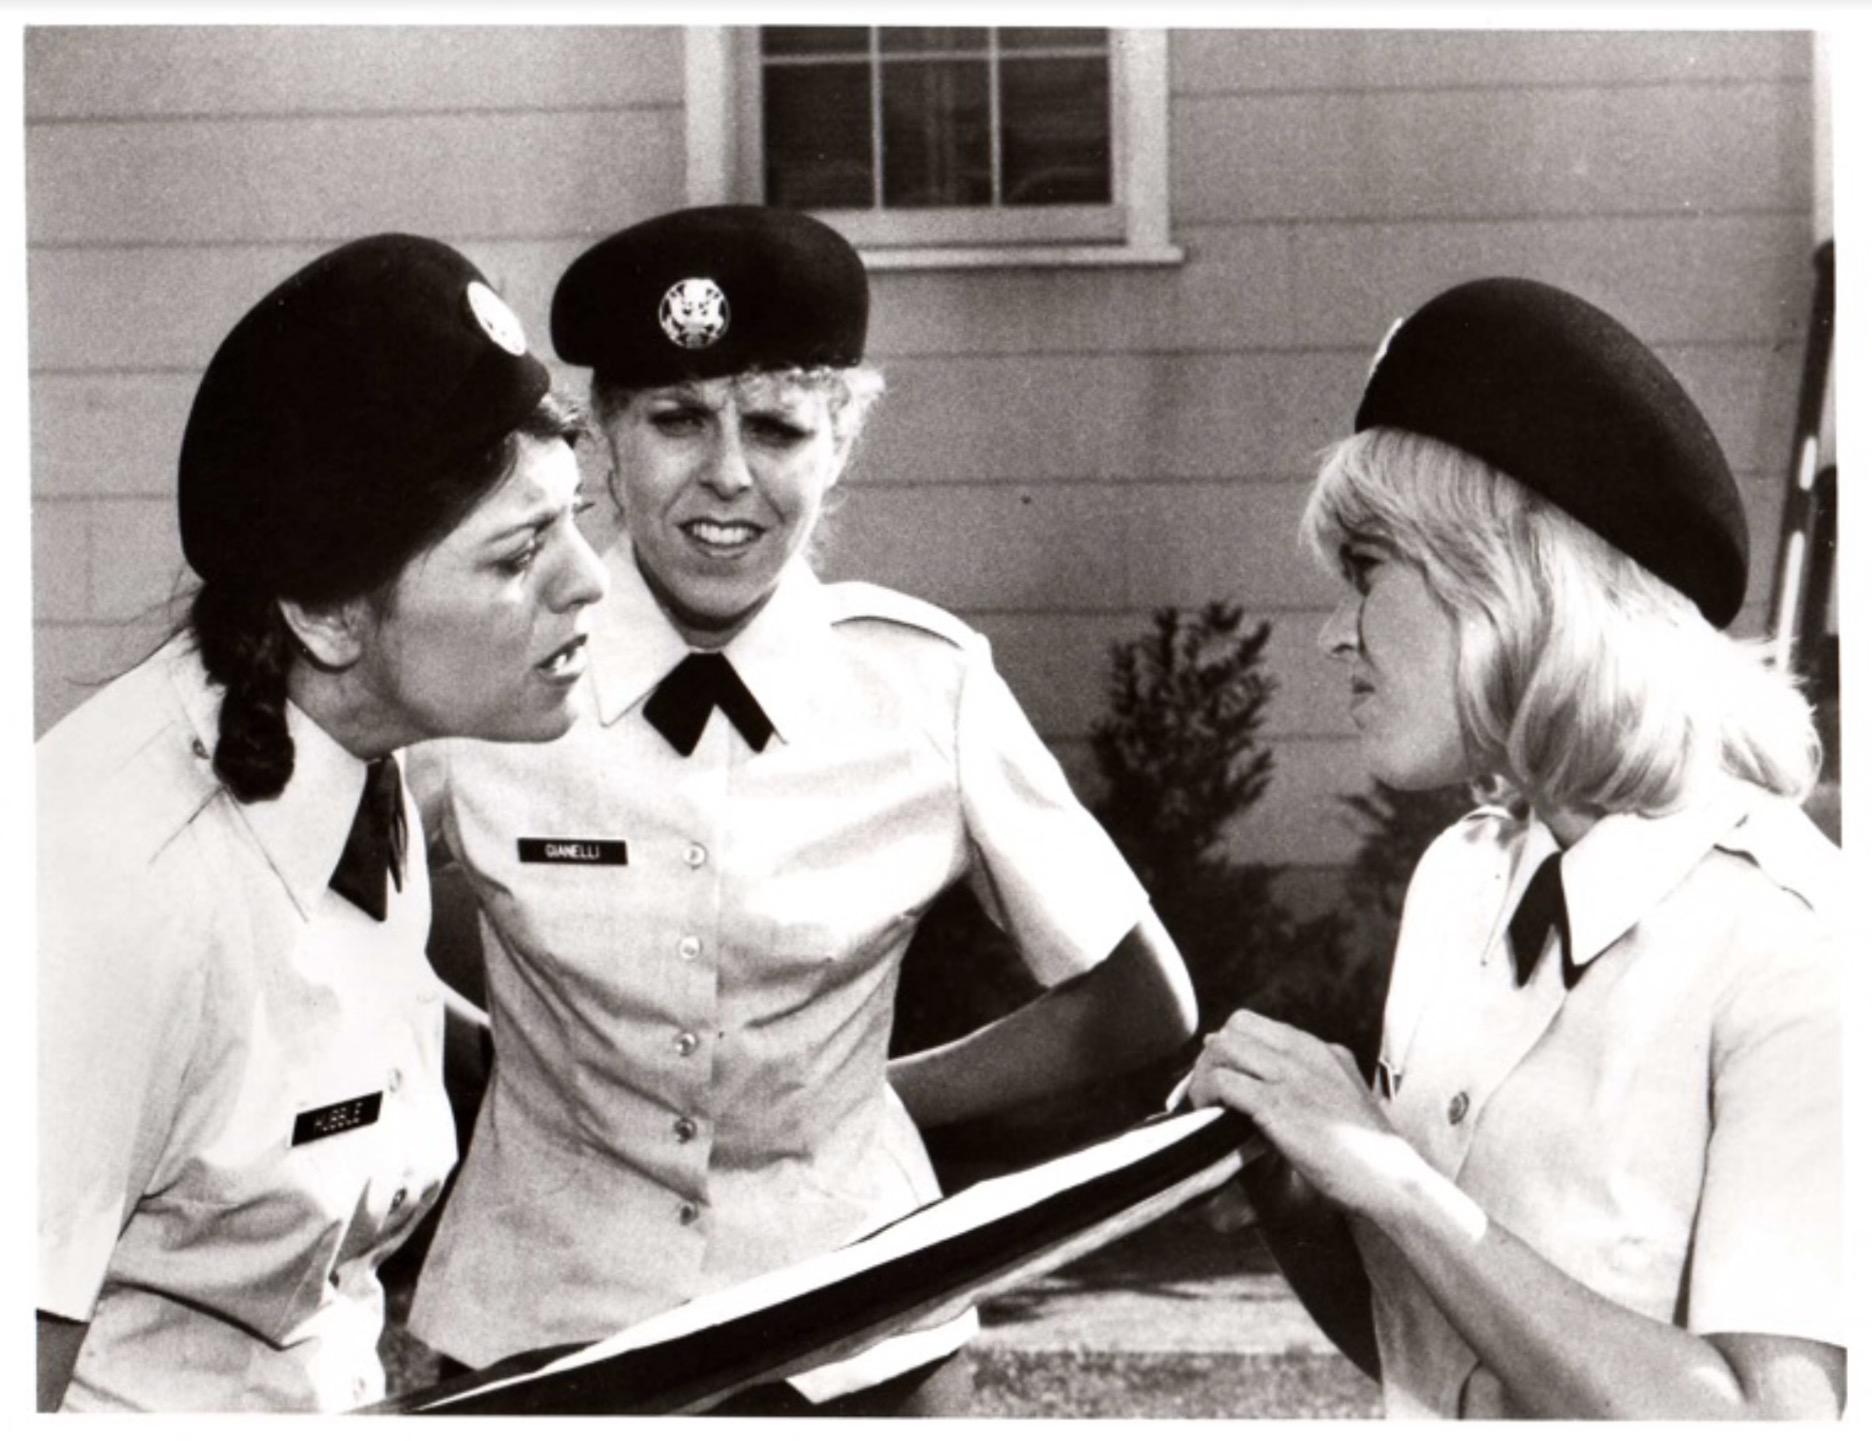 Lorna Patterson, Lisa Raggio, and Lucy Webb in Private Benjamin (1981)